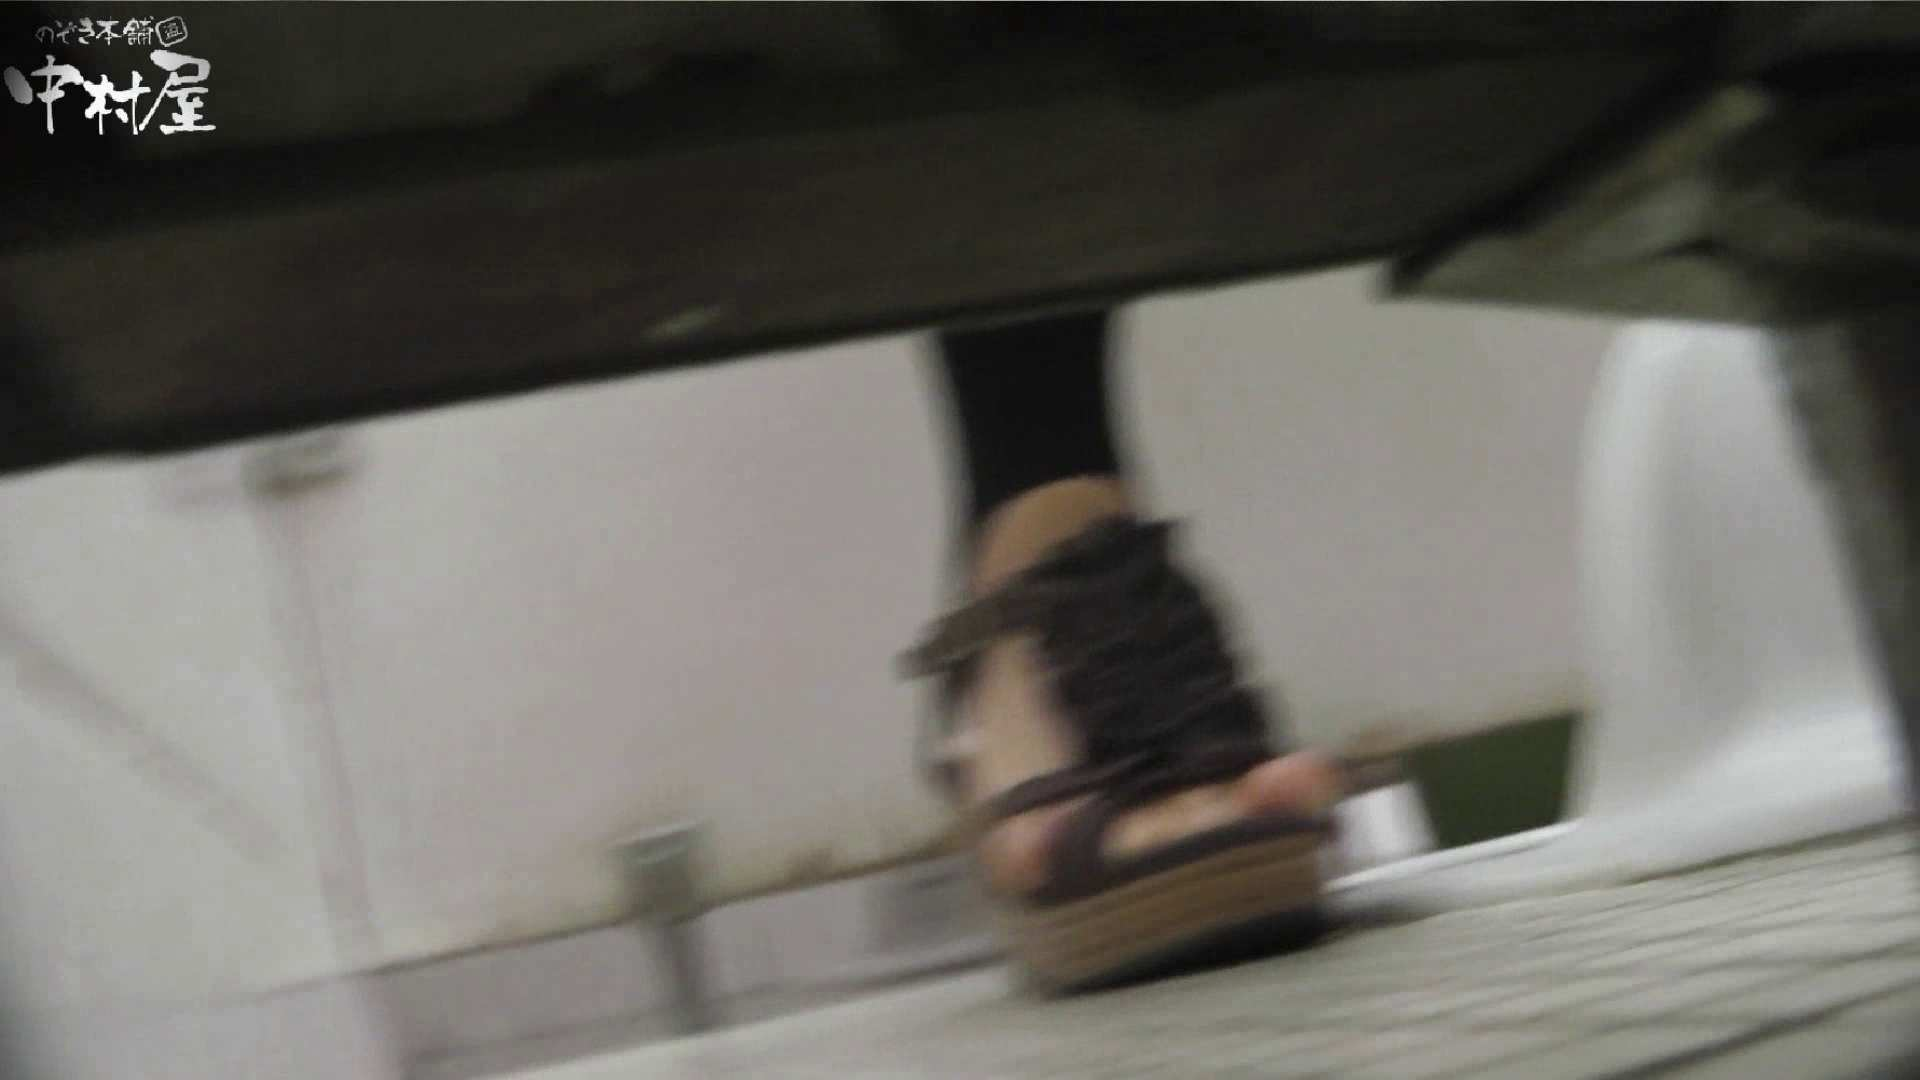 vol.38 命がけ潜伏洗面所! 巨乳さん・固め・推定200g OLセックス 覗きオメコ動画キャプチャ 56画像 2